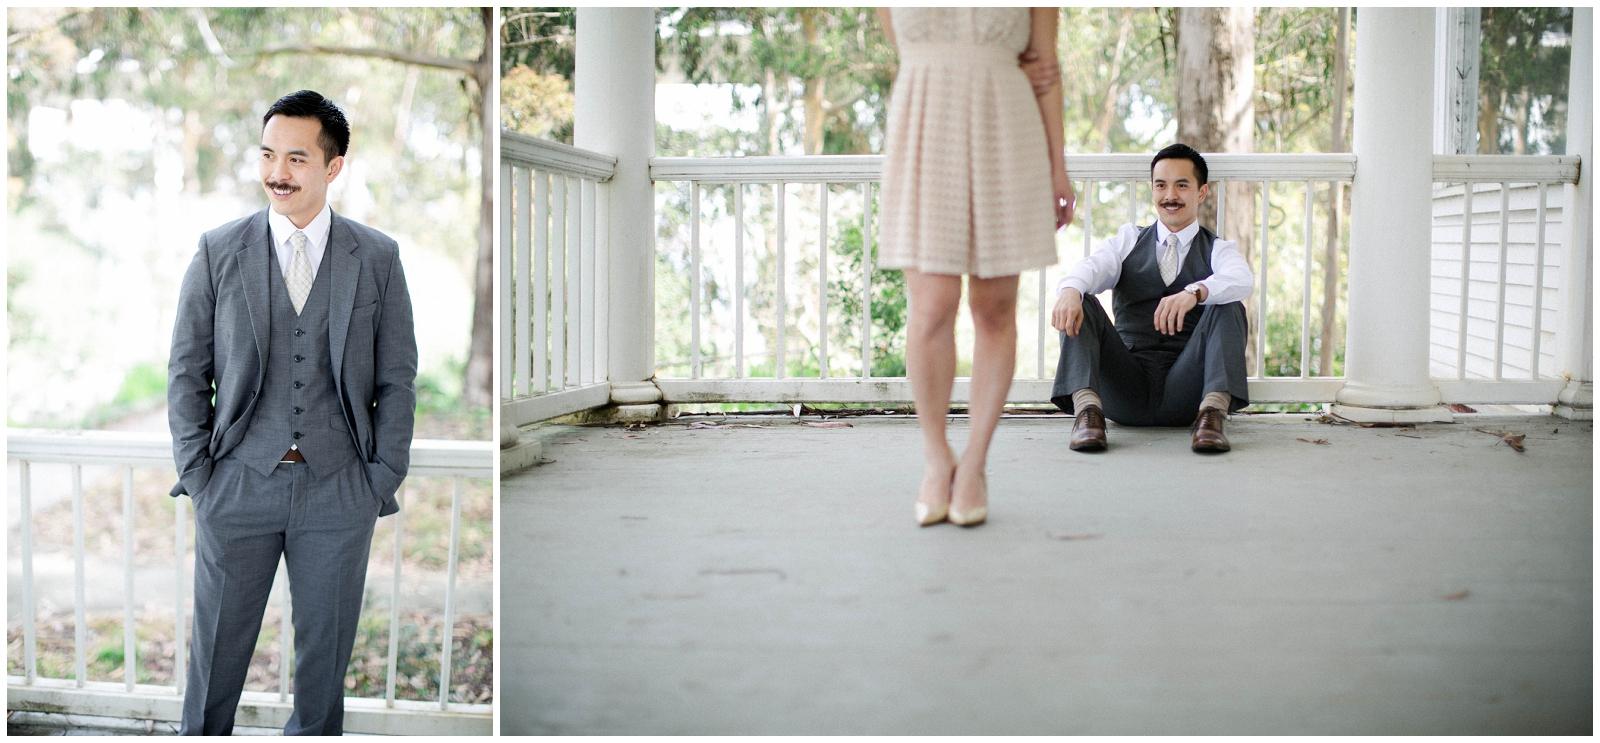 San-Francisco-Bay-Area-Wedding-Photography-Engagement-Treasure-Island-15.jpg